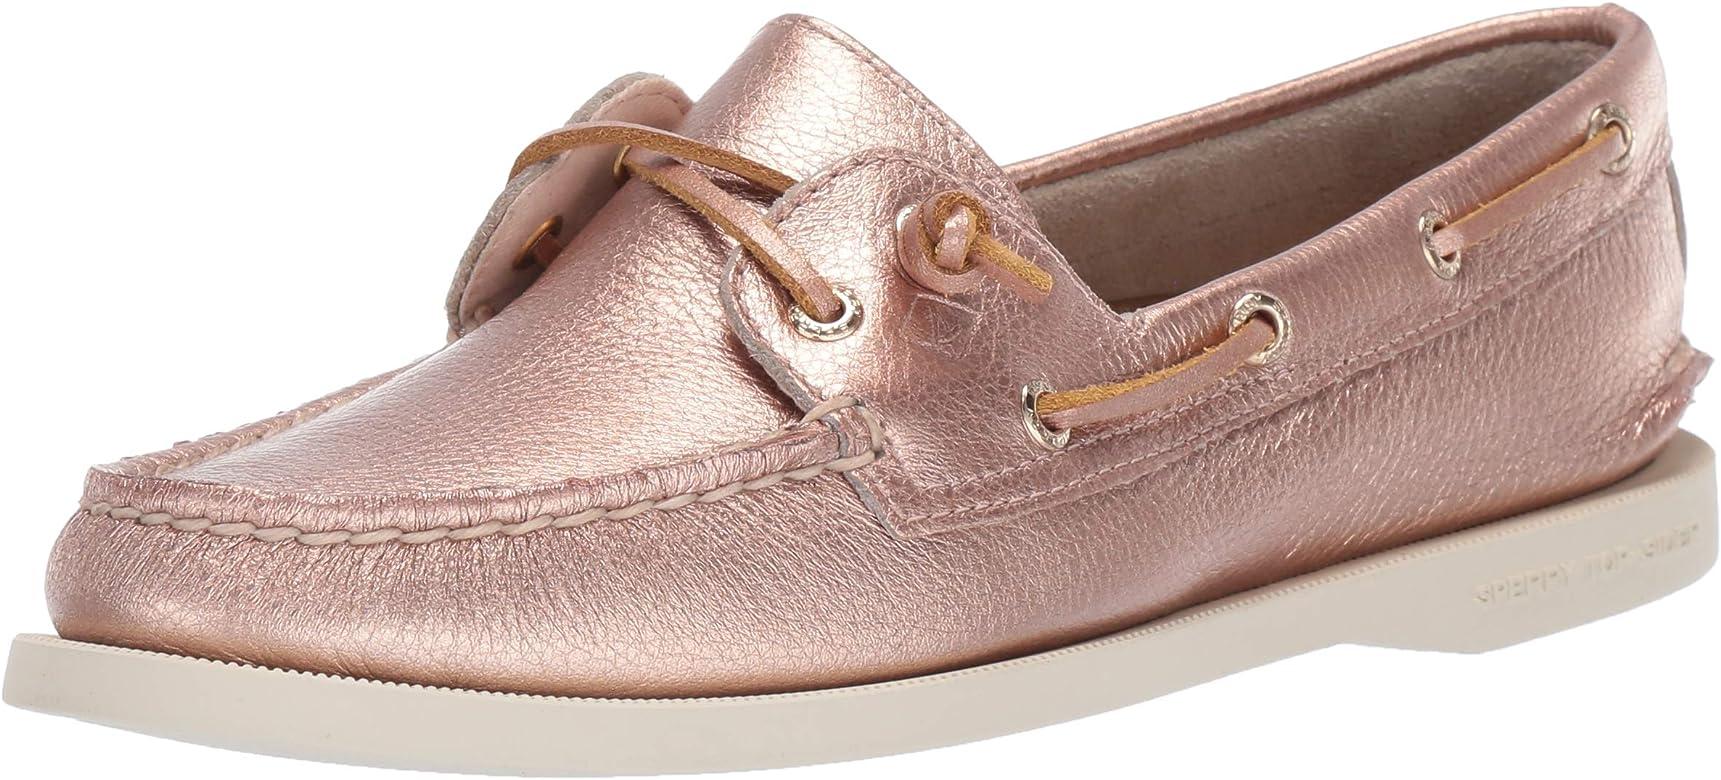 O VIDA Metallic Boat Shoe